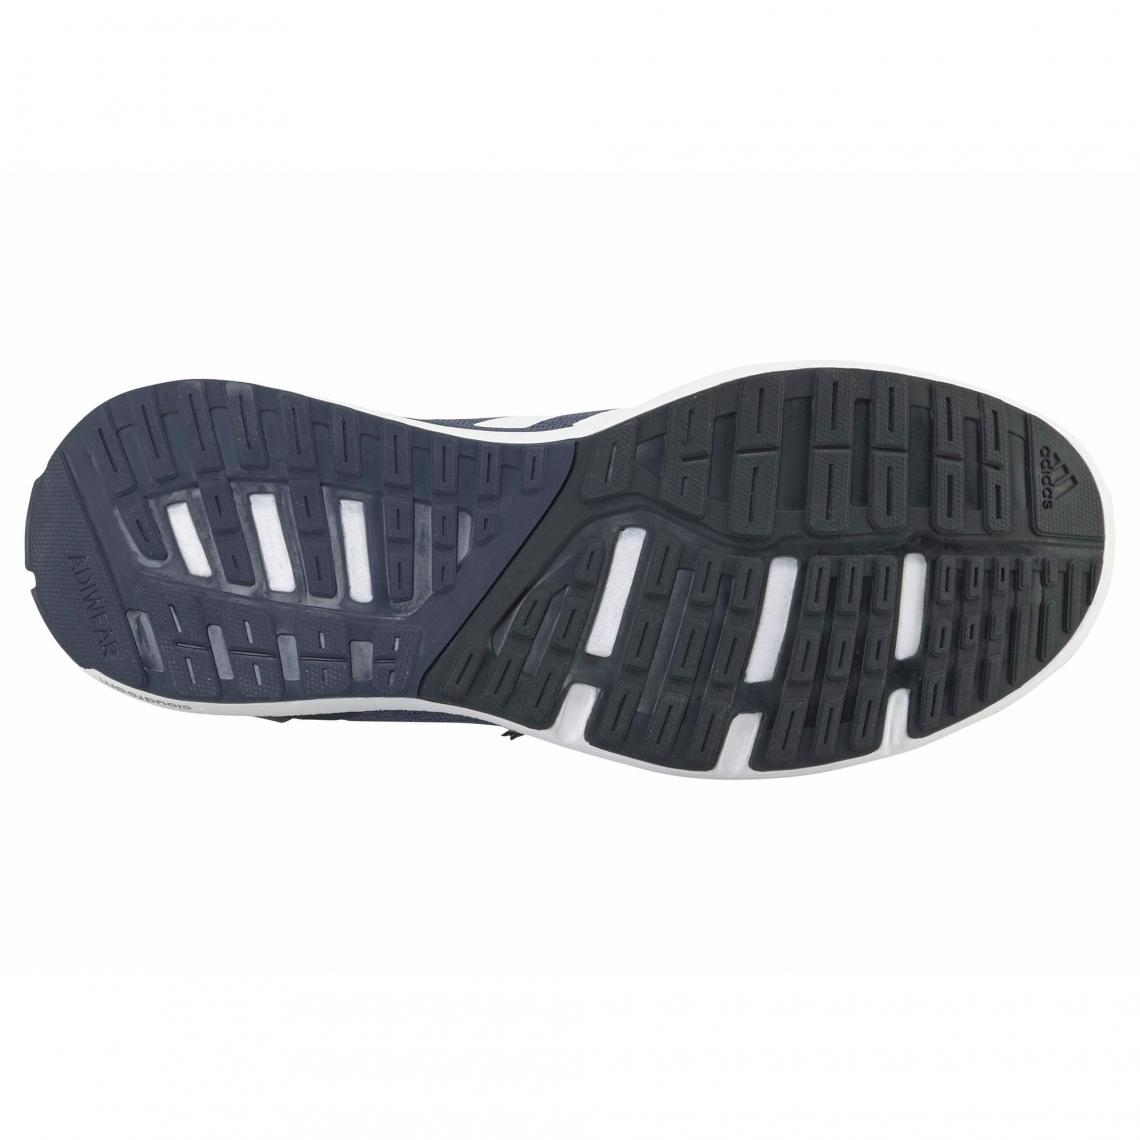 quality design 75a63 9c9e6 Basket running Cosmic 2 W adidas Performance pour homme - Marine - Blanc  Adidas Performance